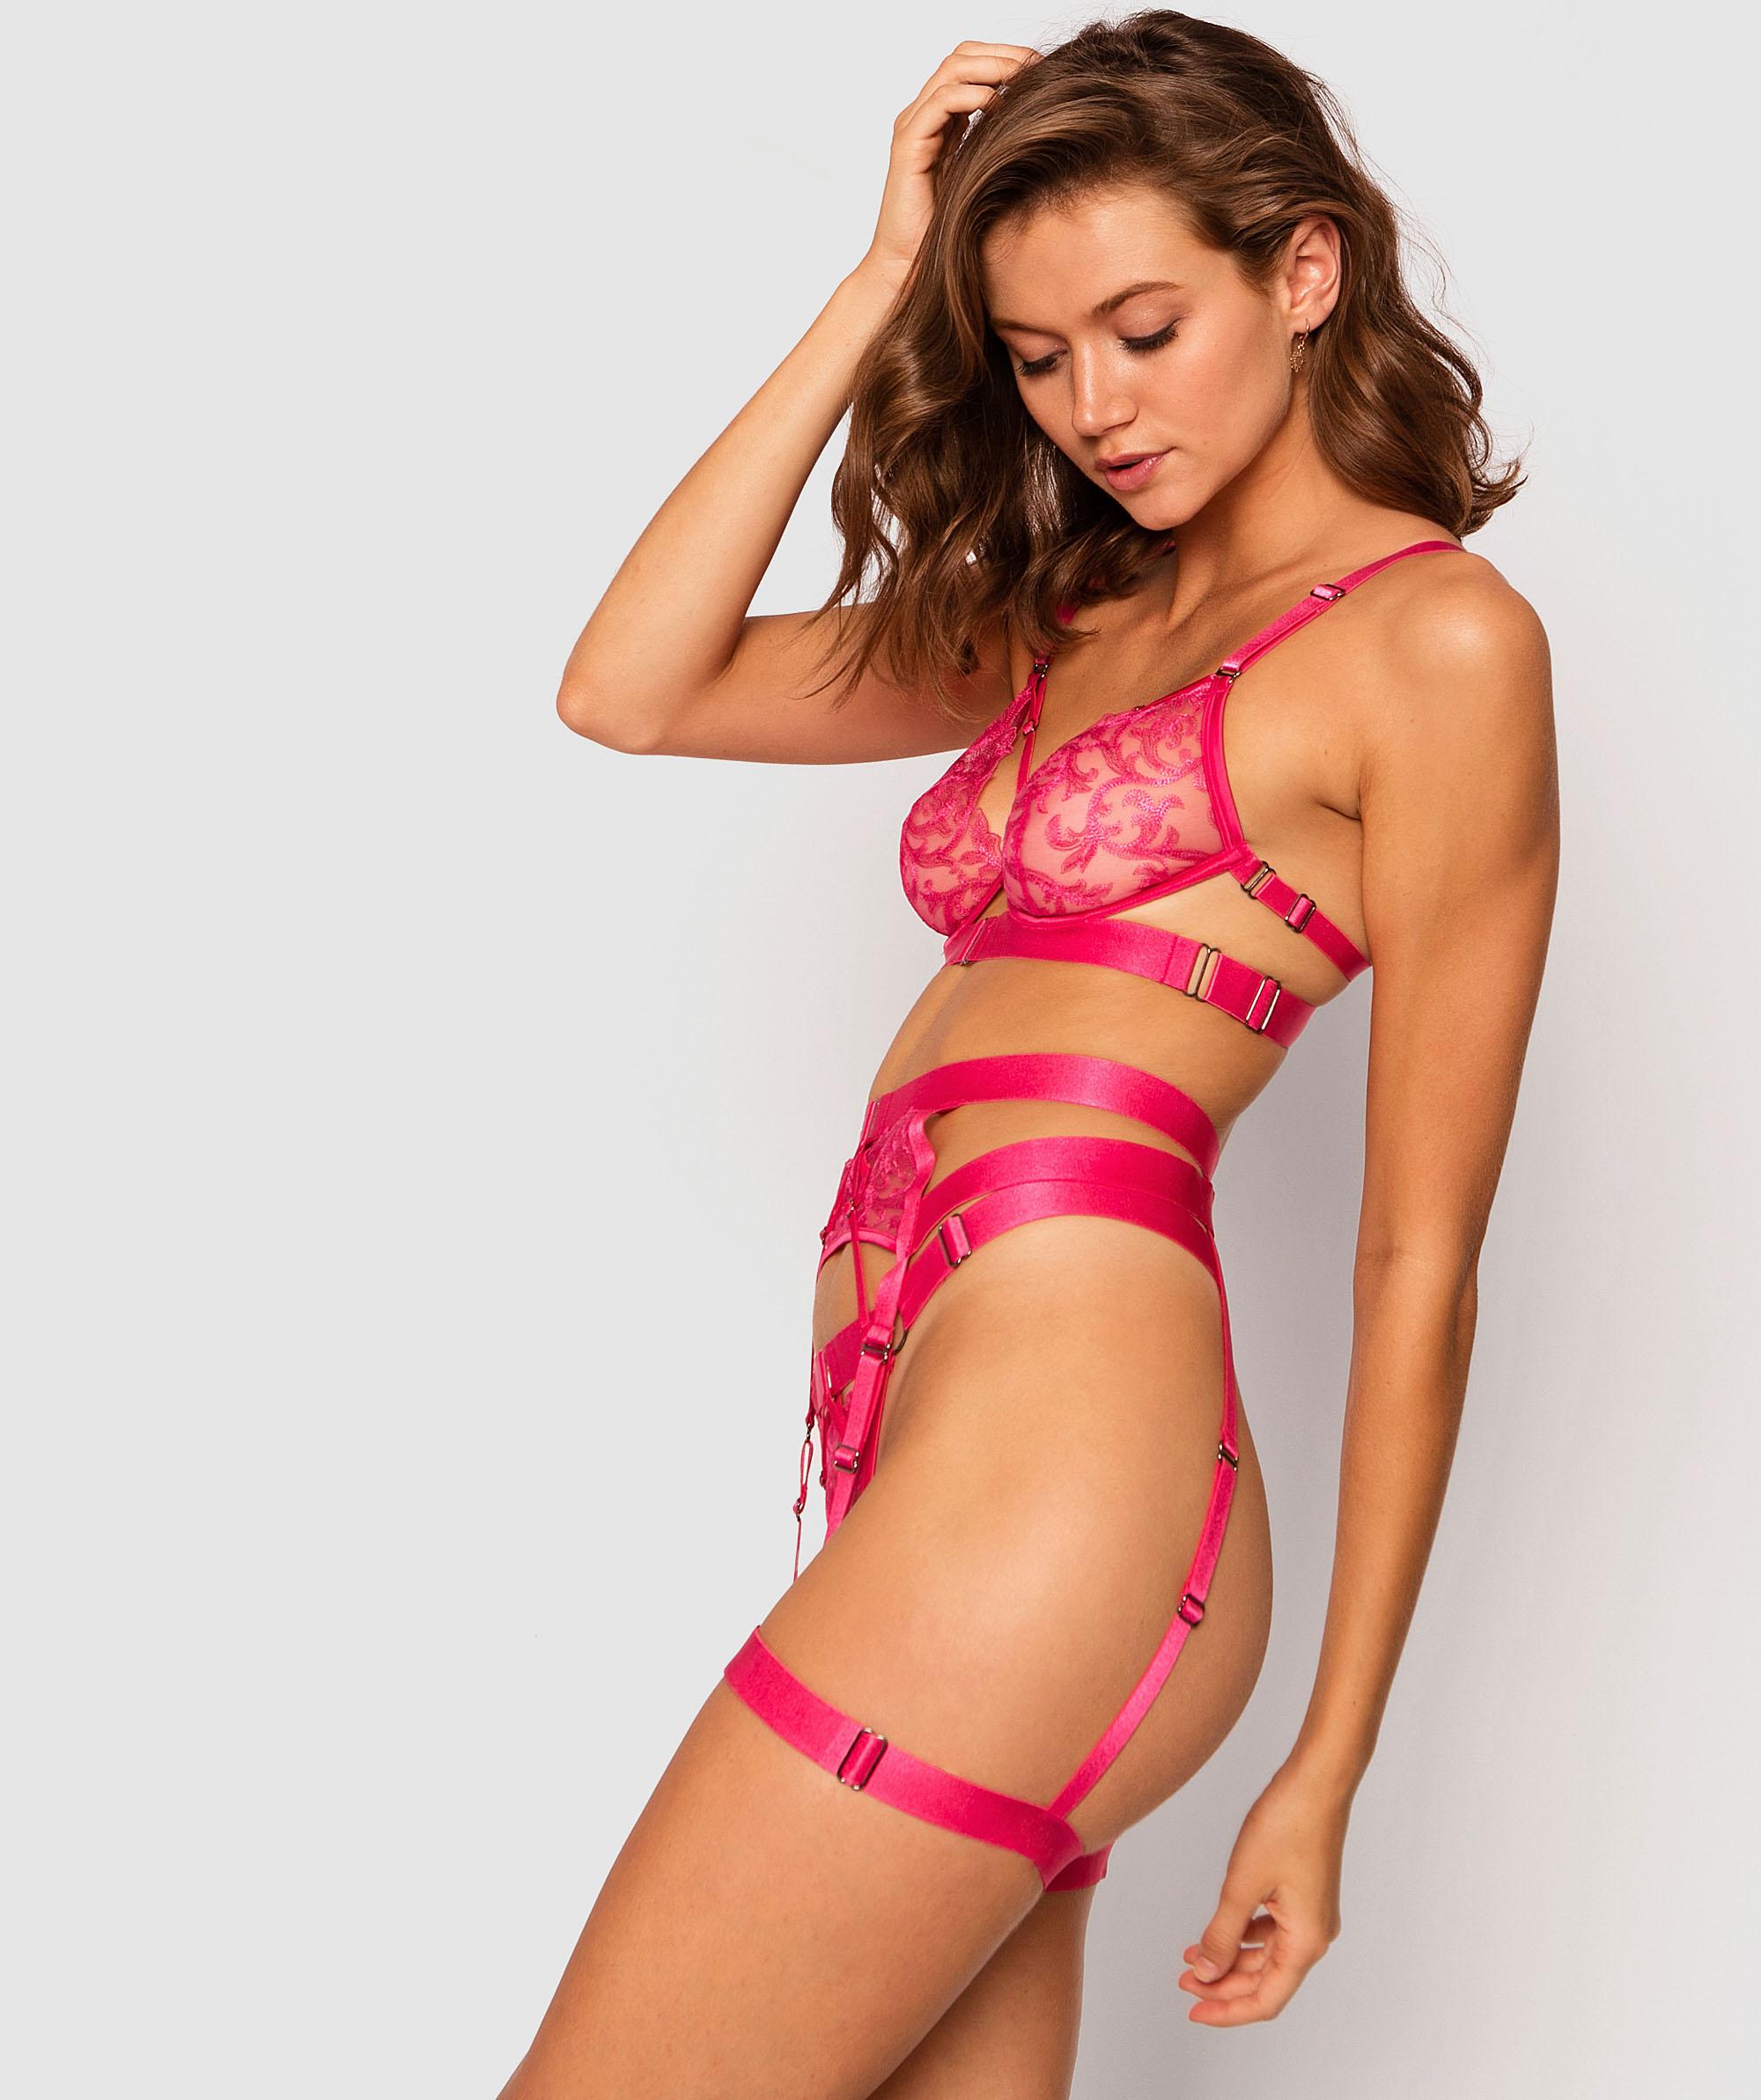 Electra Fling Suspender - Dark Pink